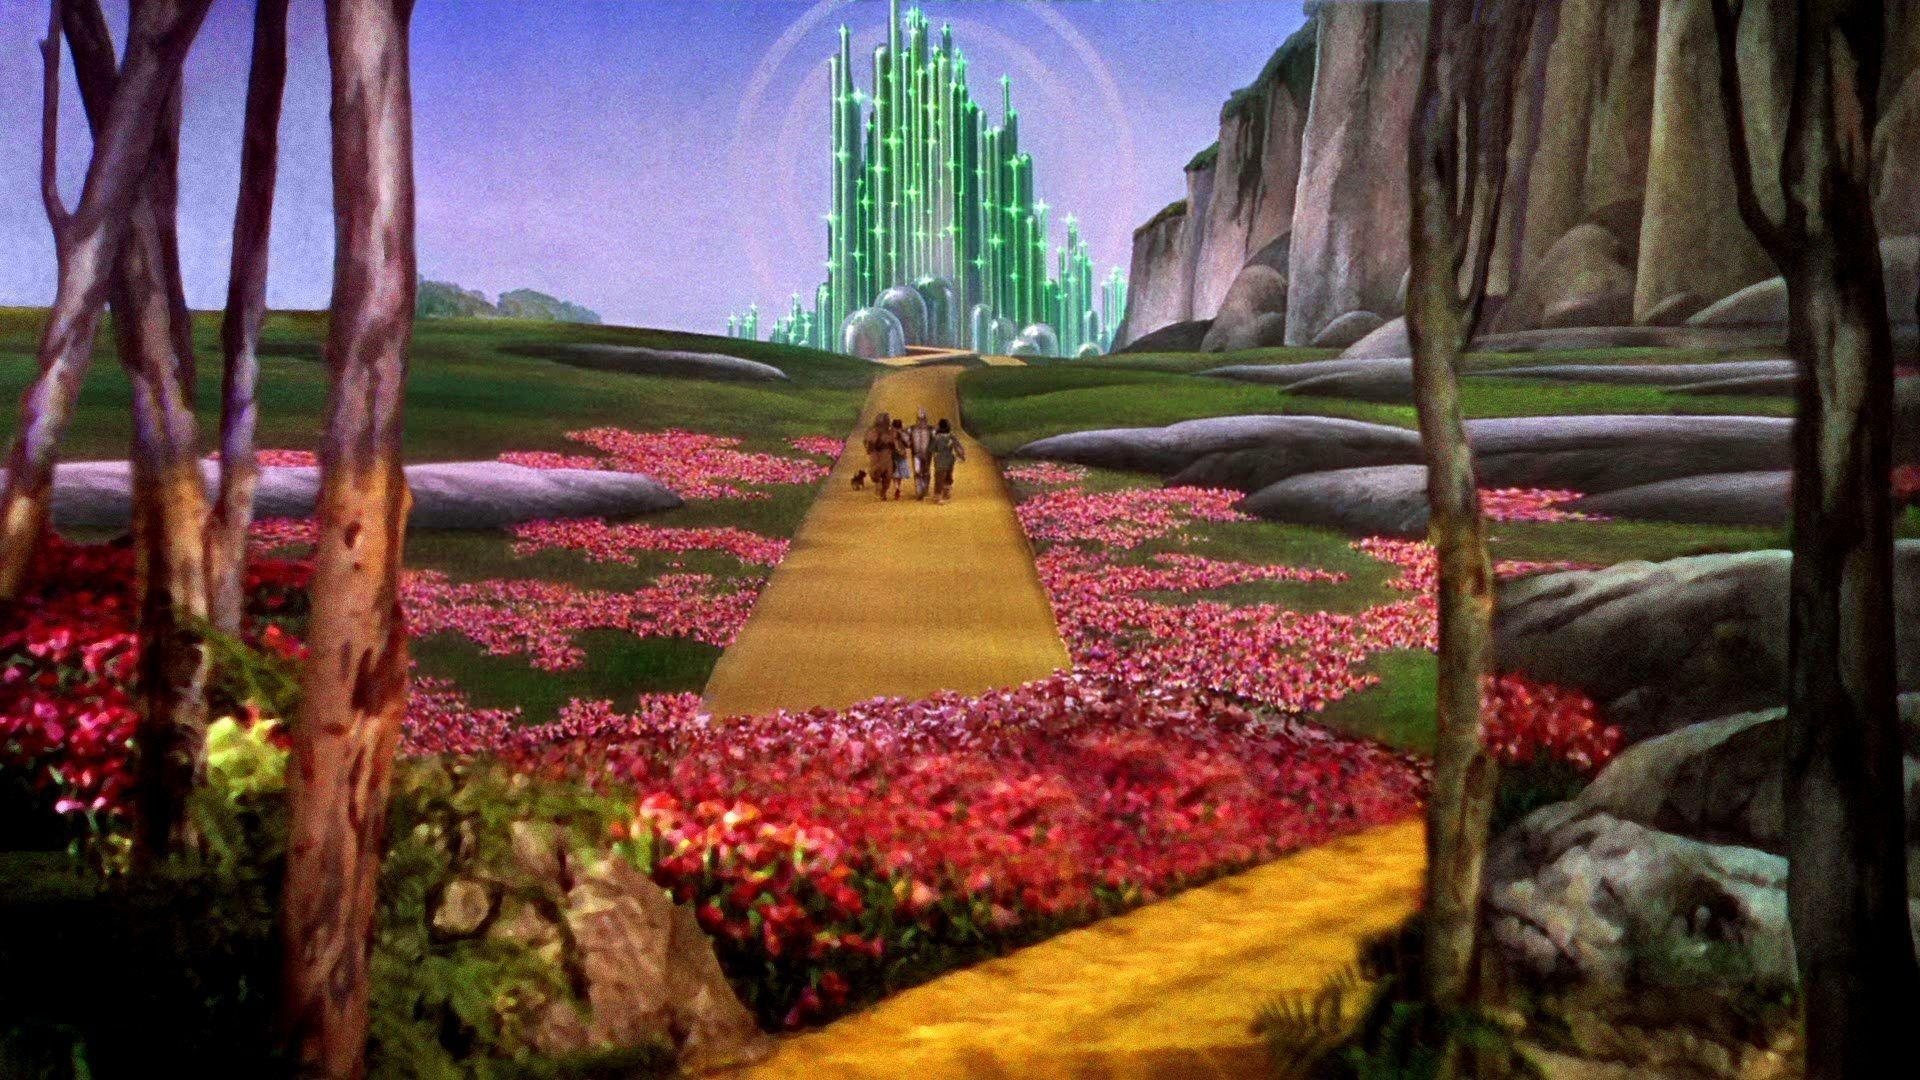 pic Wizard Of Oz Wallpaper wizard of oz desktop wallpapers